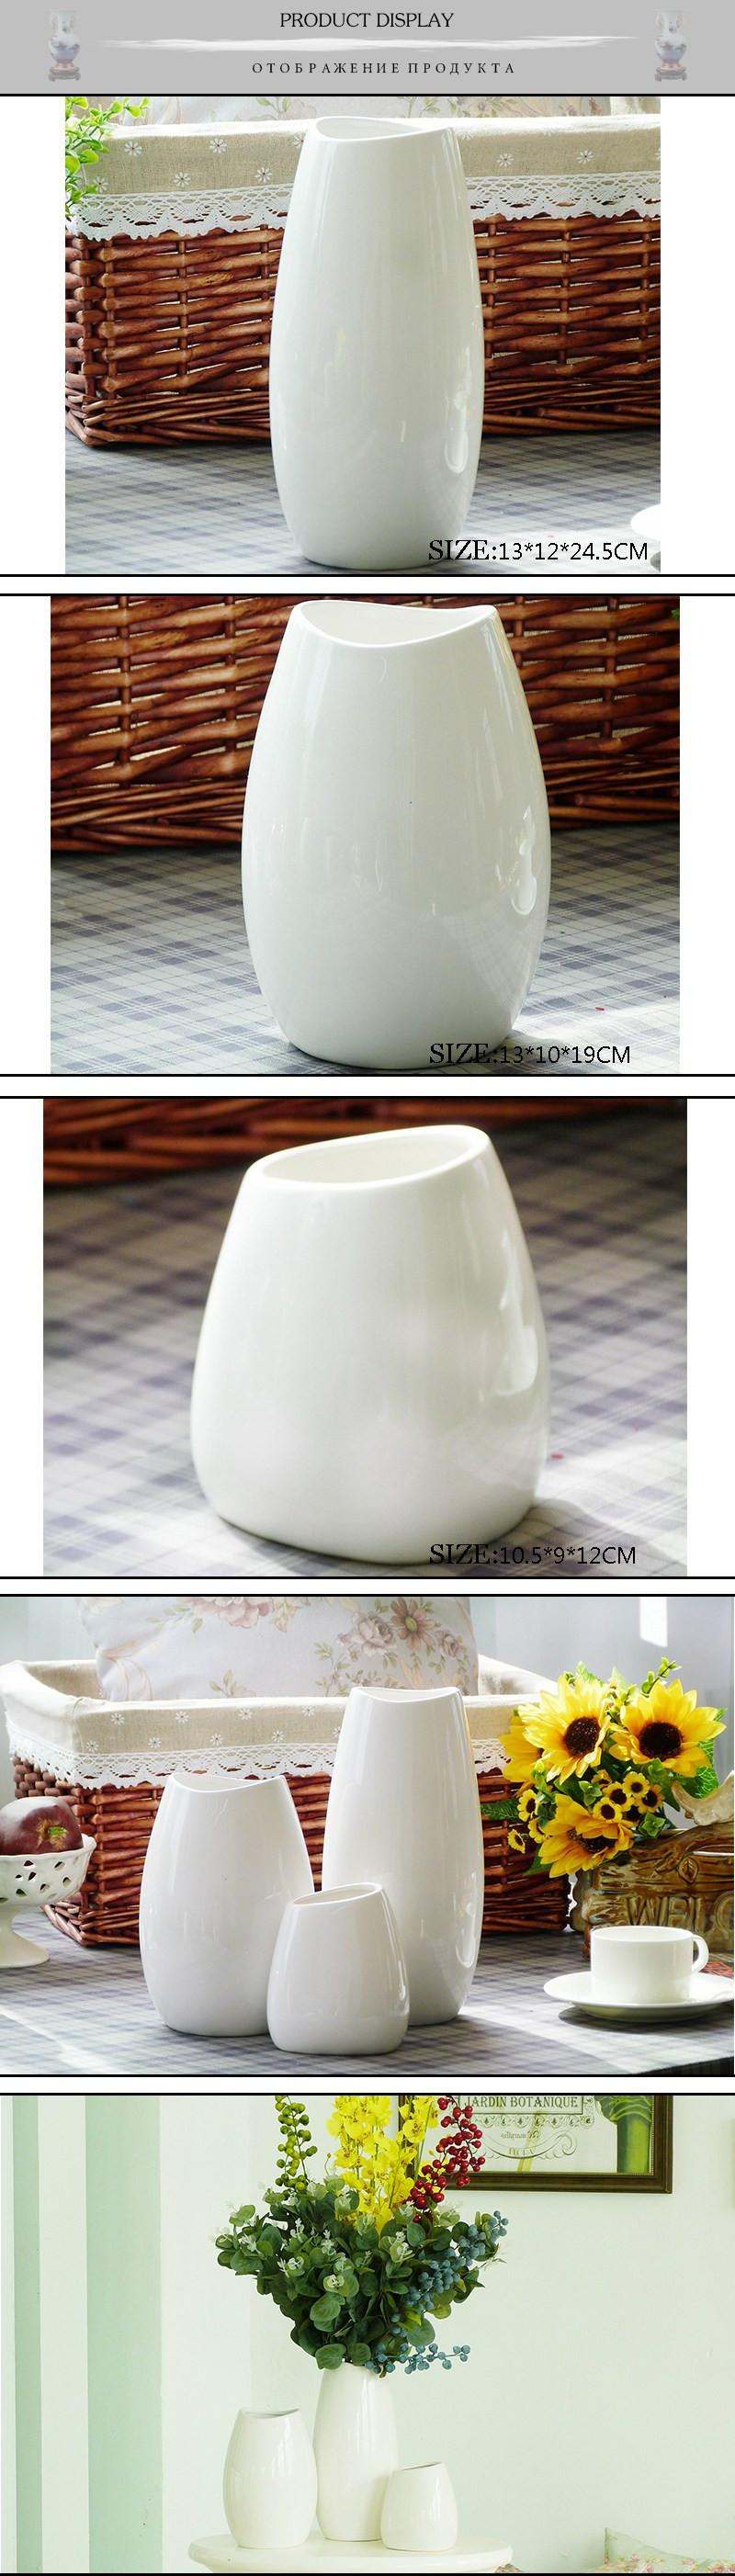 16 inch cylinder vases bulk of a‰§classic crafts white porcelain vase modern desktop small vase in classic crafts white porcelain vase modern desktop small vase creative home decoration gifts ulknn